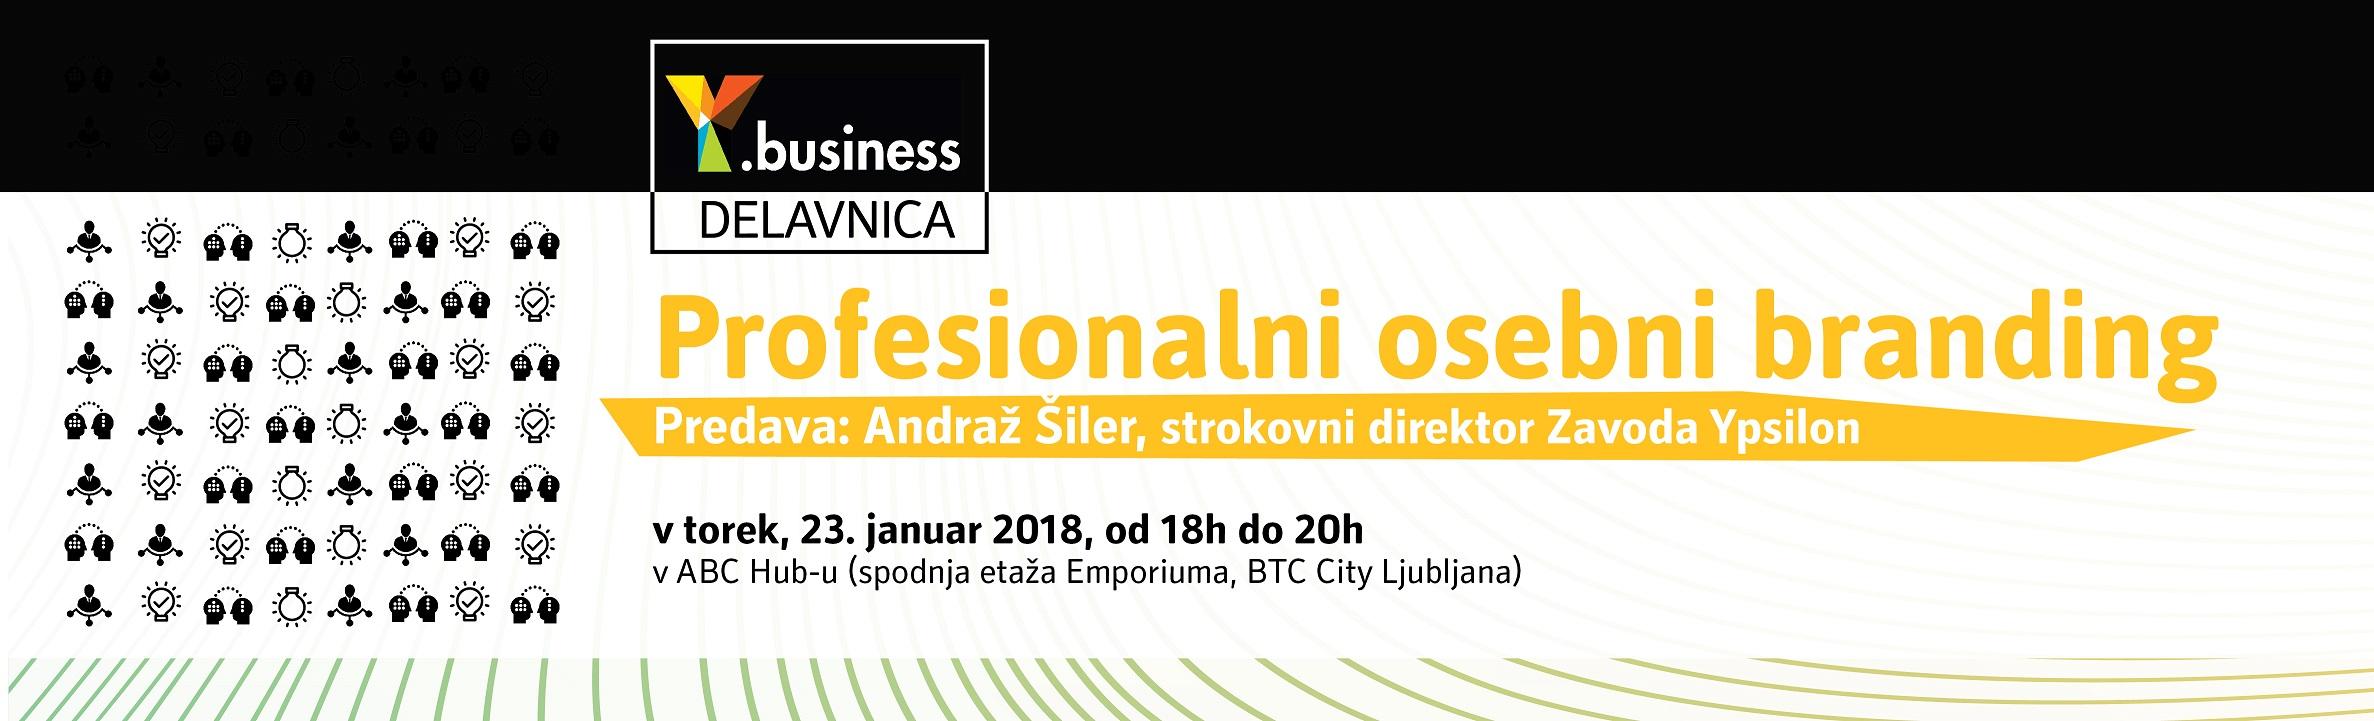 Ybusiness Profesionalni Osebni Branding Januar 2018 small